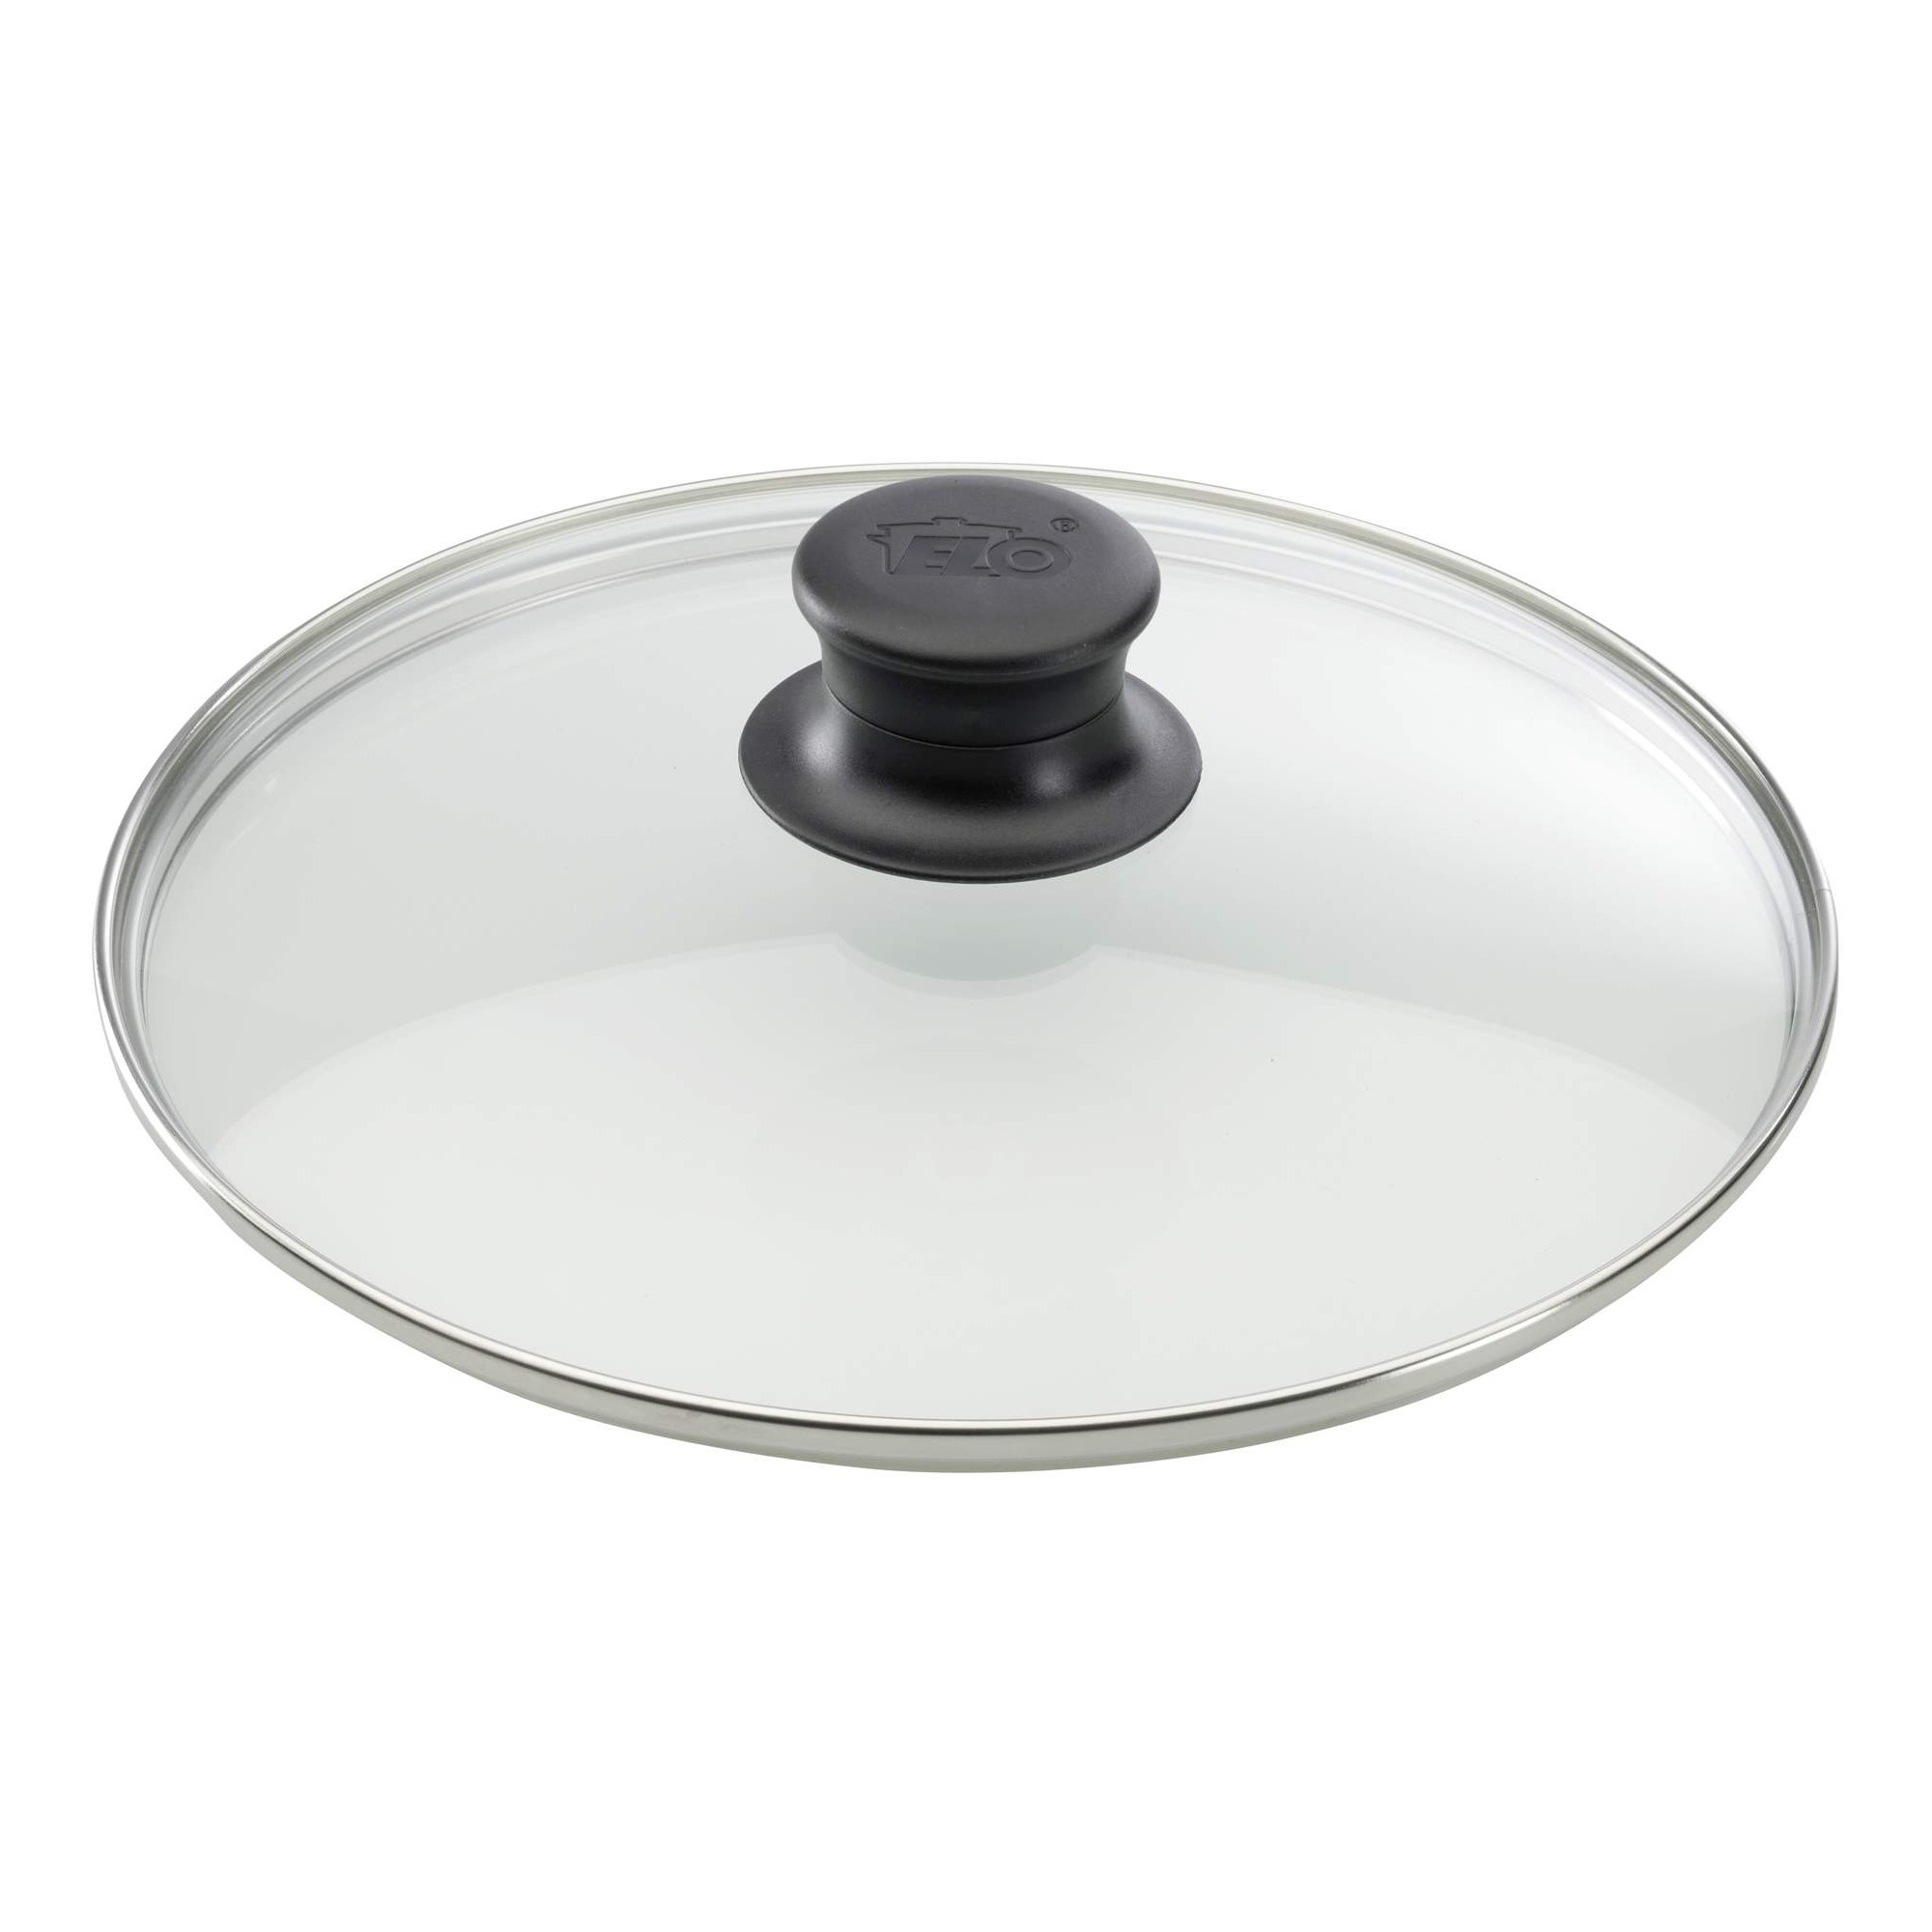 Elo glasdeckel mit edelstahlrand kunststoffknopf 32 cm for Pfannendeckel 30 cm